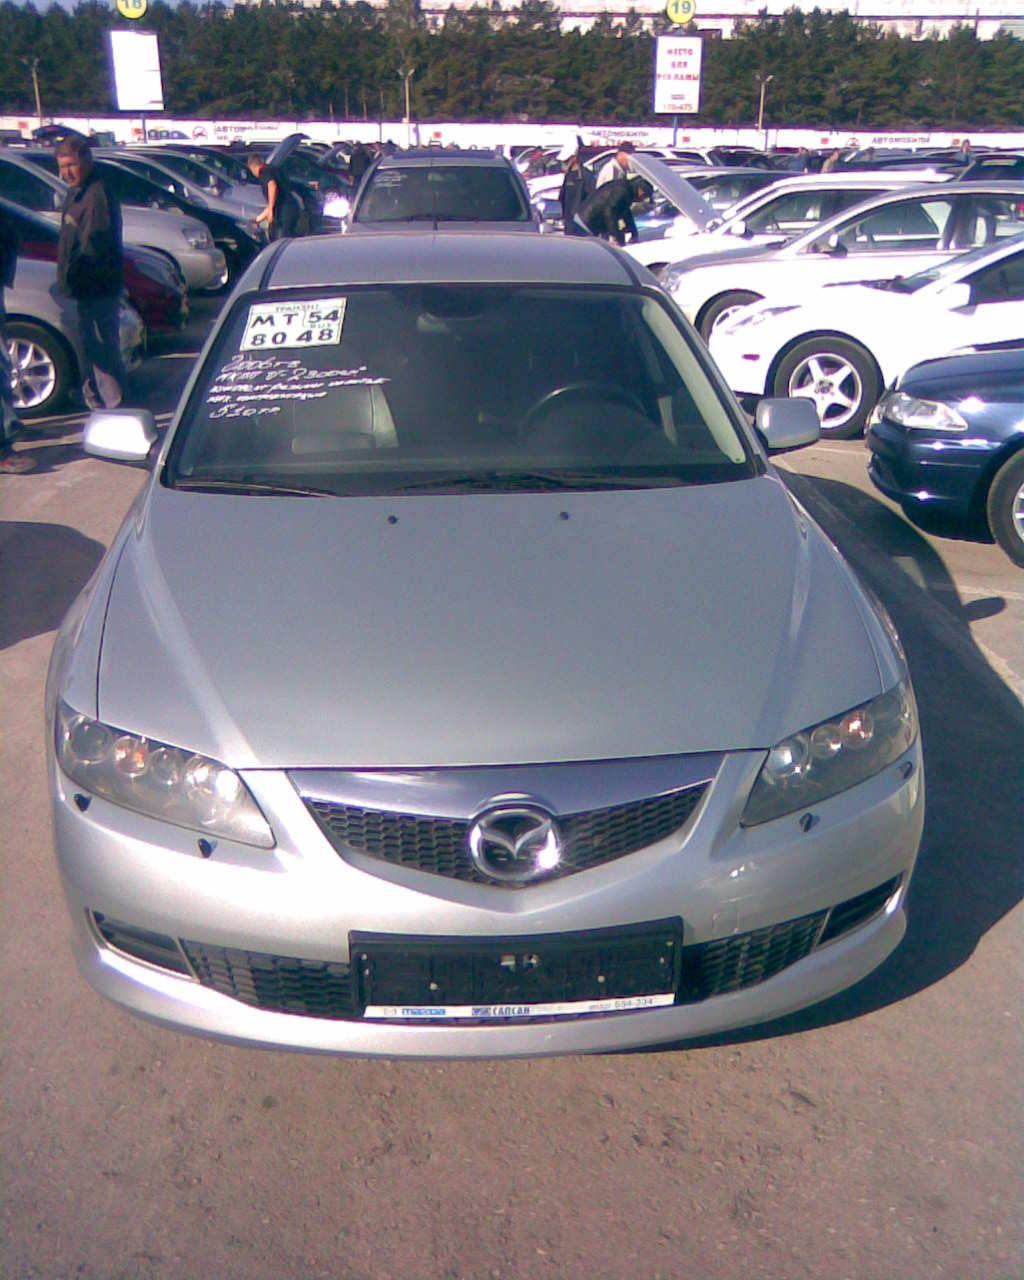 2006 Mazda Mazda6 Photos, 2.3, Gasoline, FF, Manual For Sale